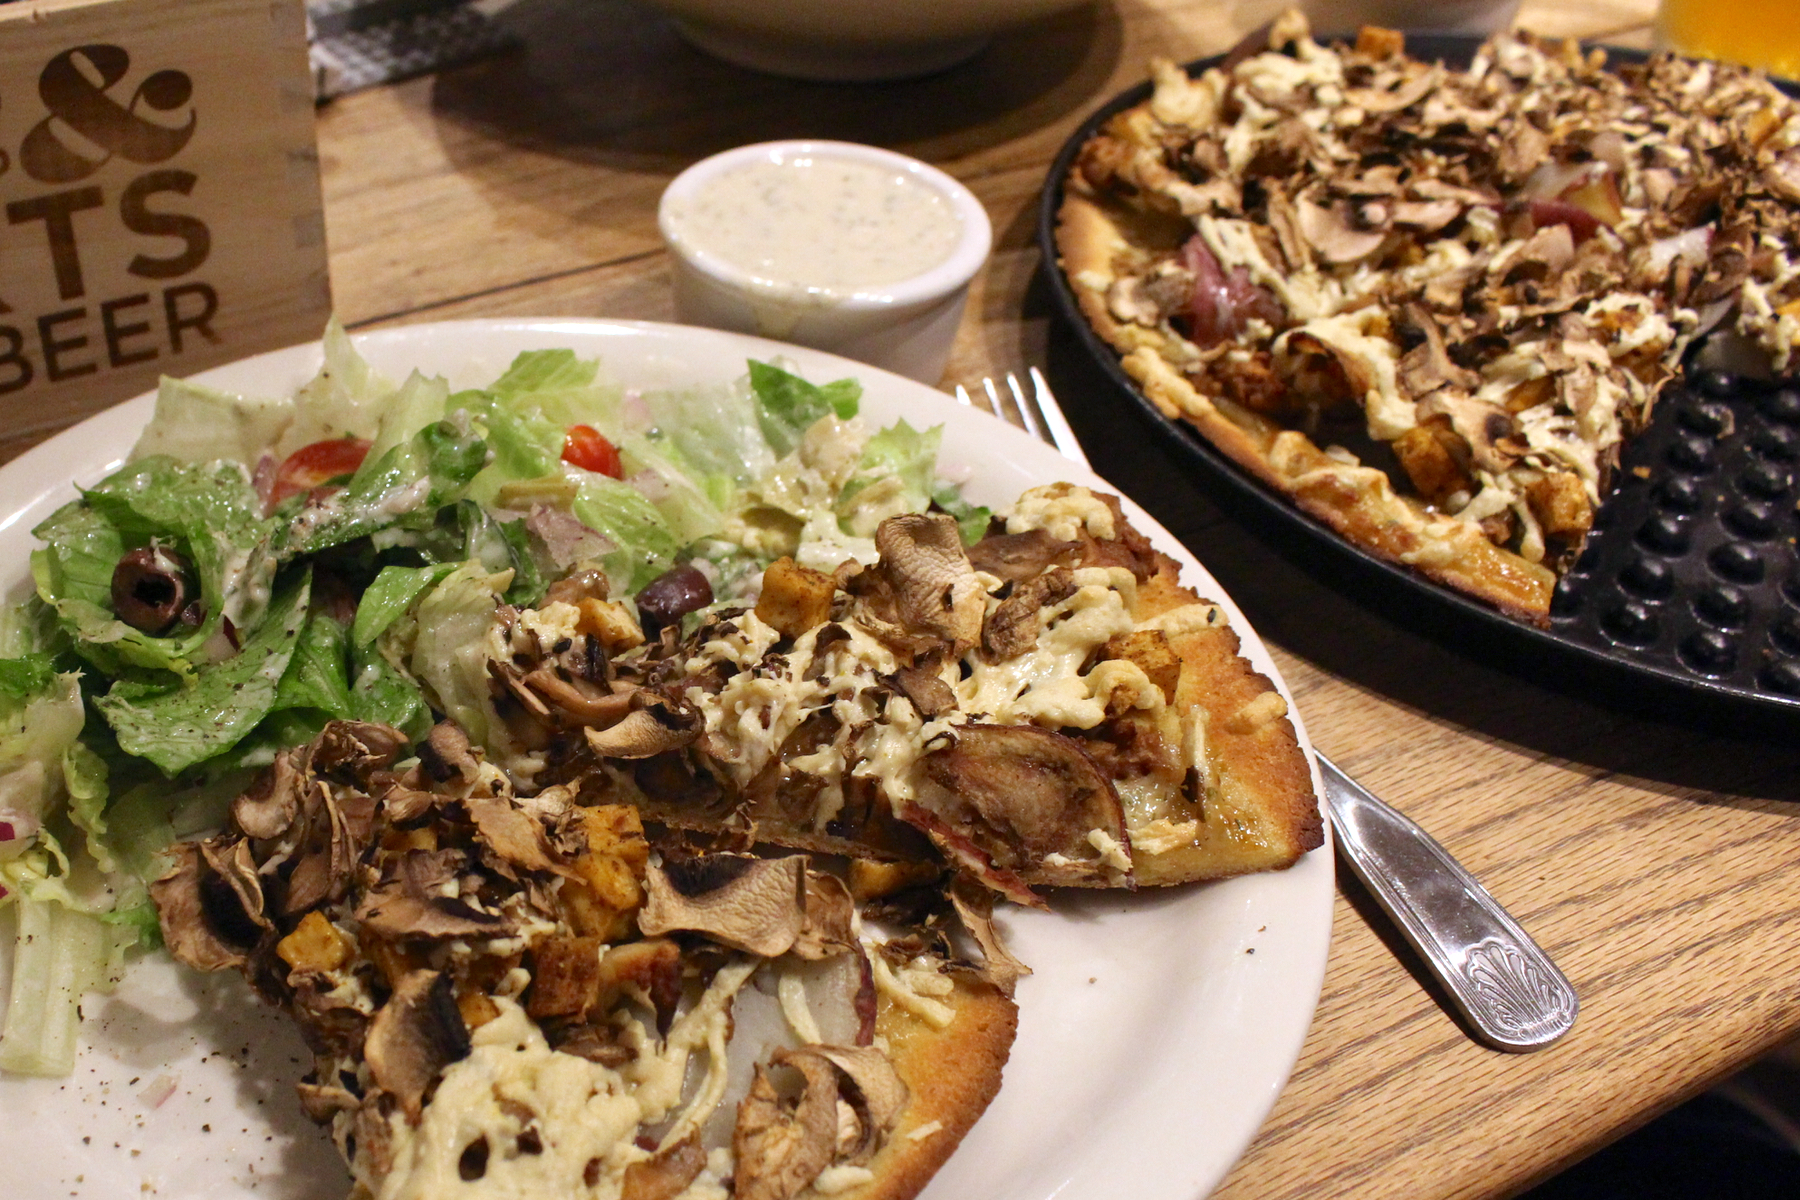 ... rosemary potatoes, mushroom medley, tofu, and garlic. With vegan ranch